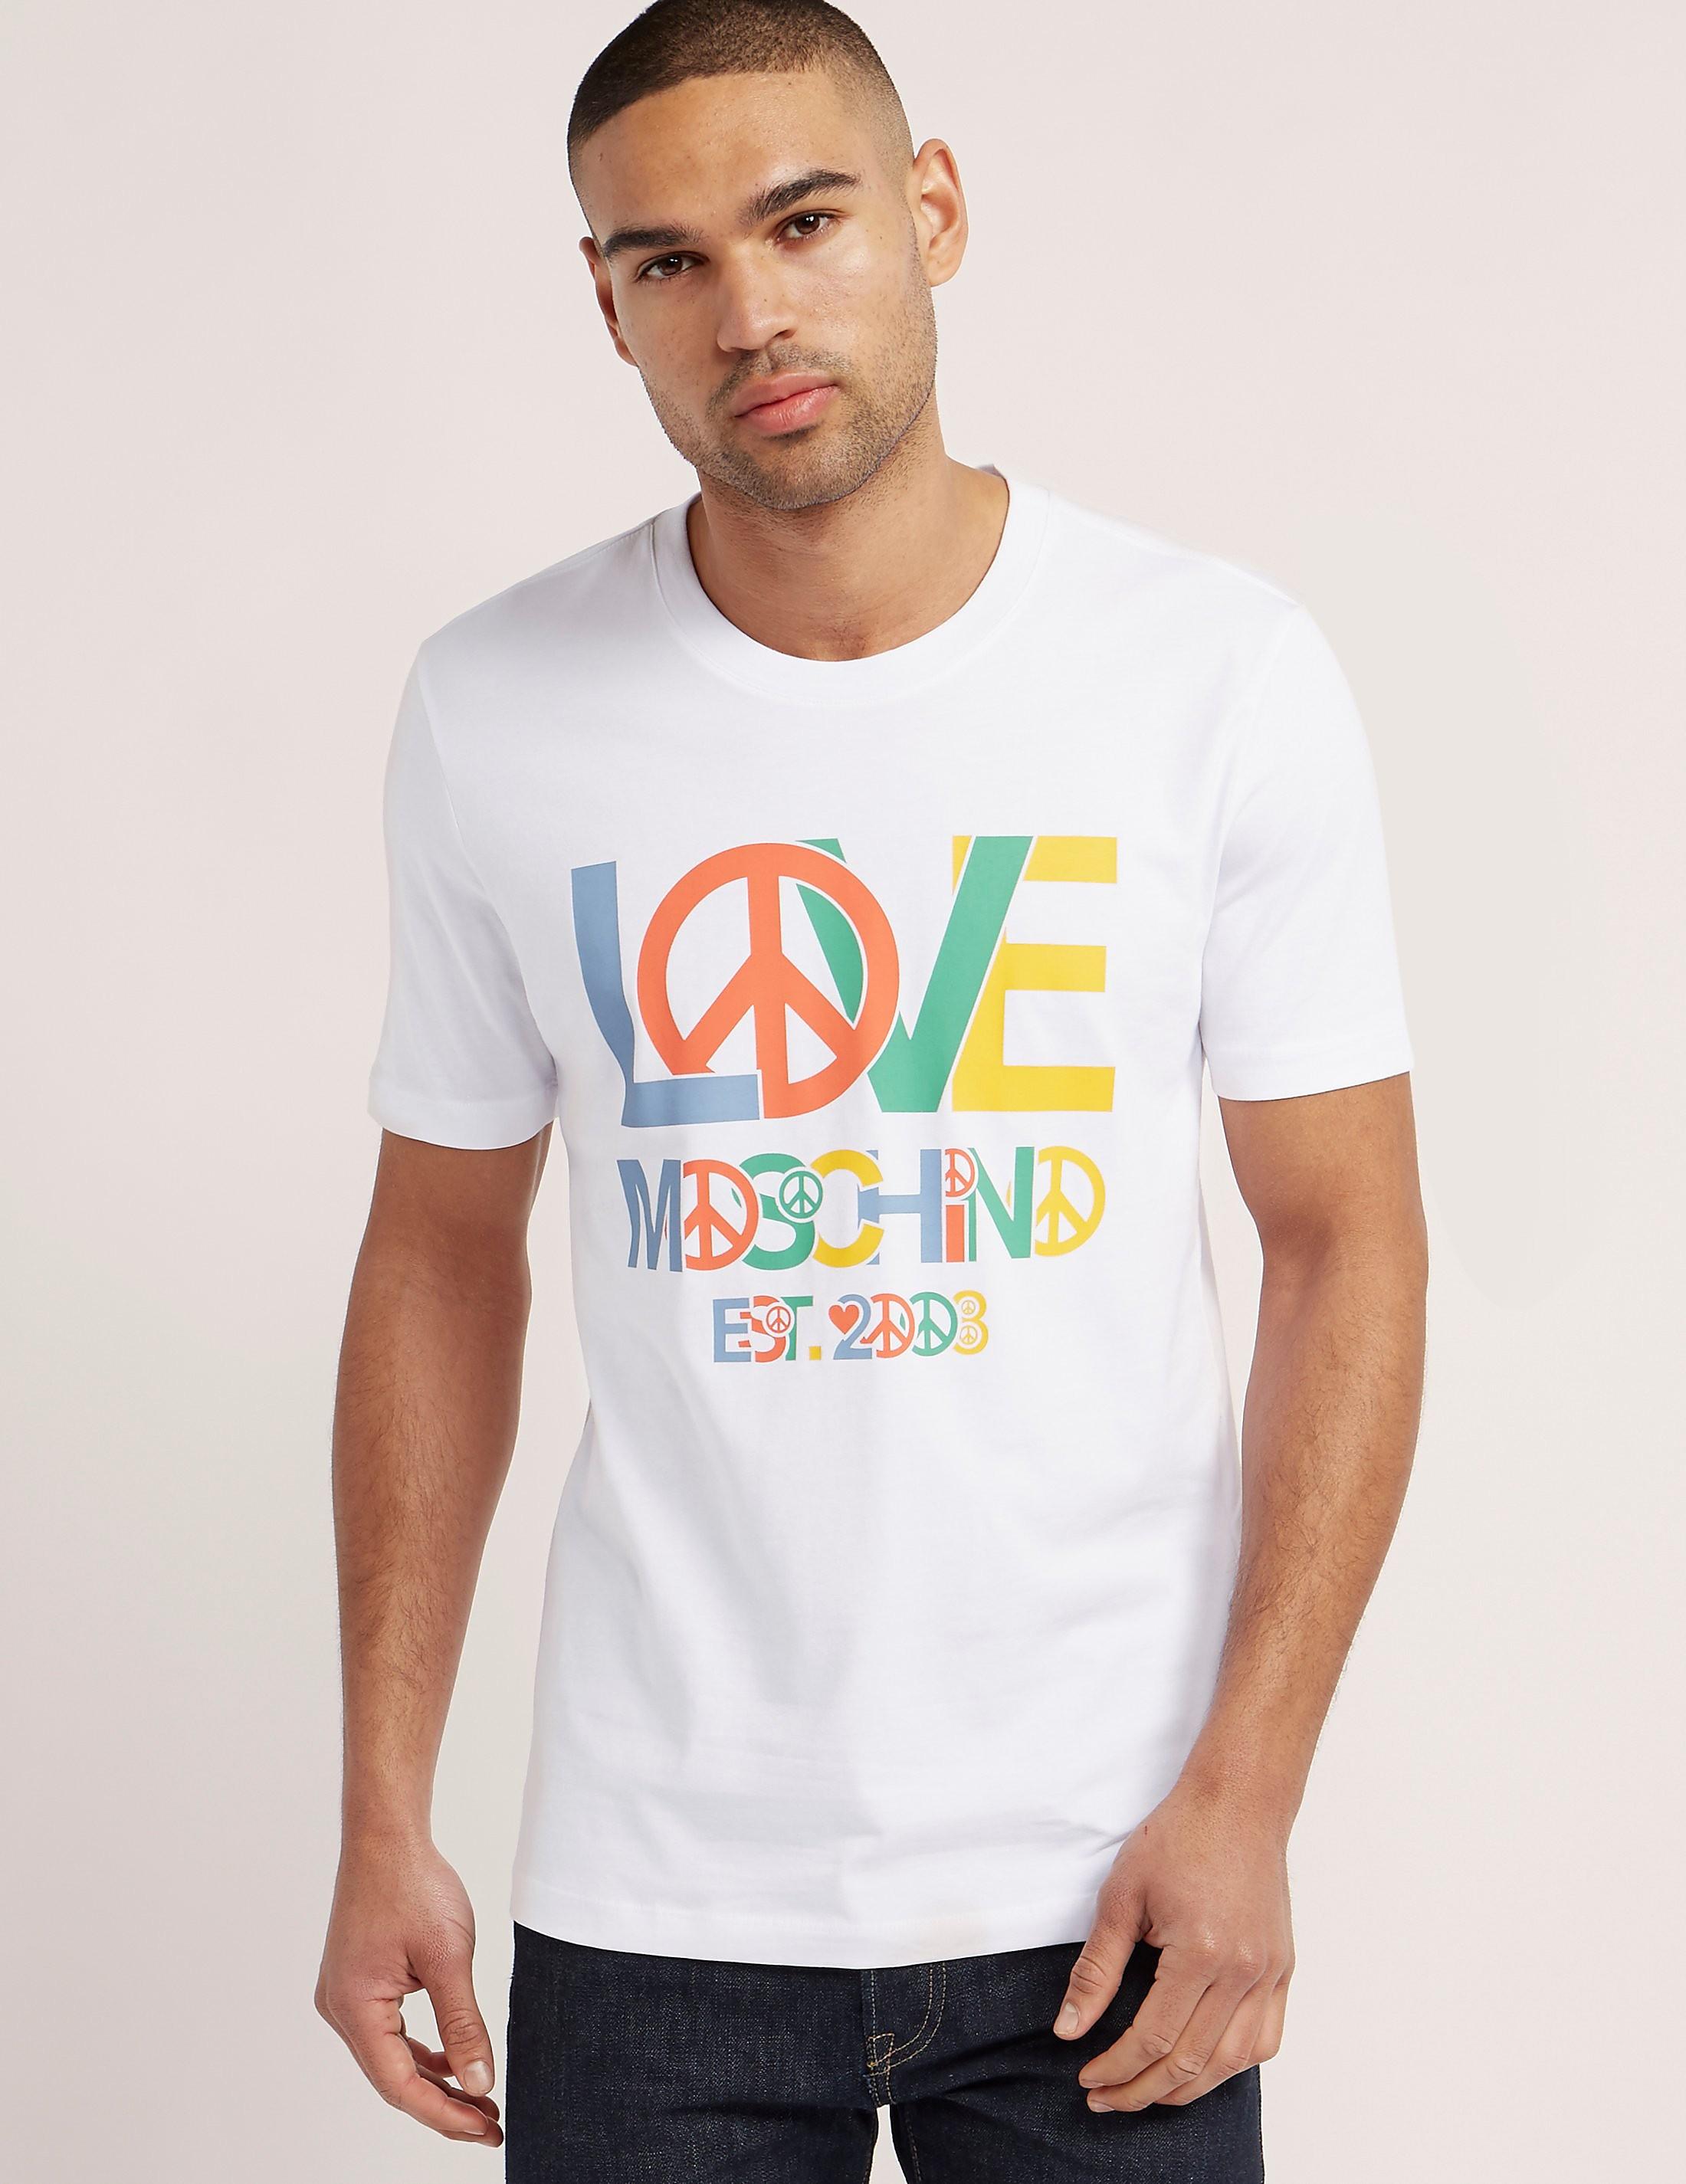 Love Moschino Logo Short Sleeve T-Shirt